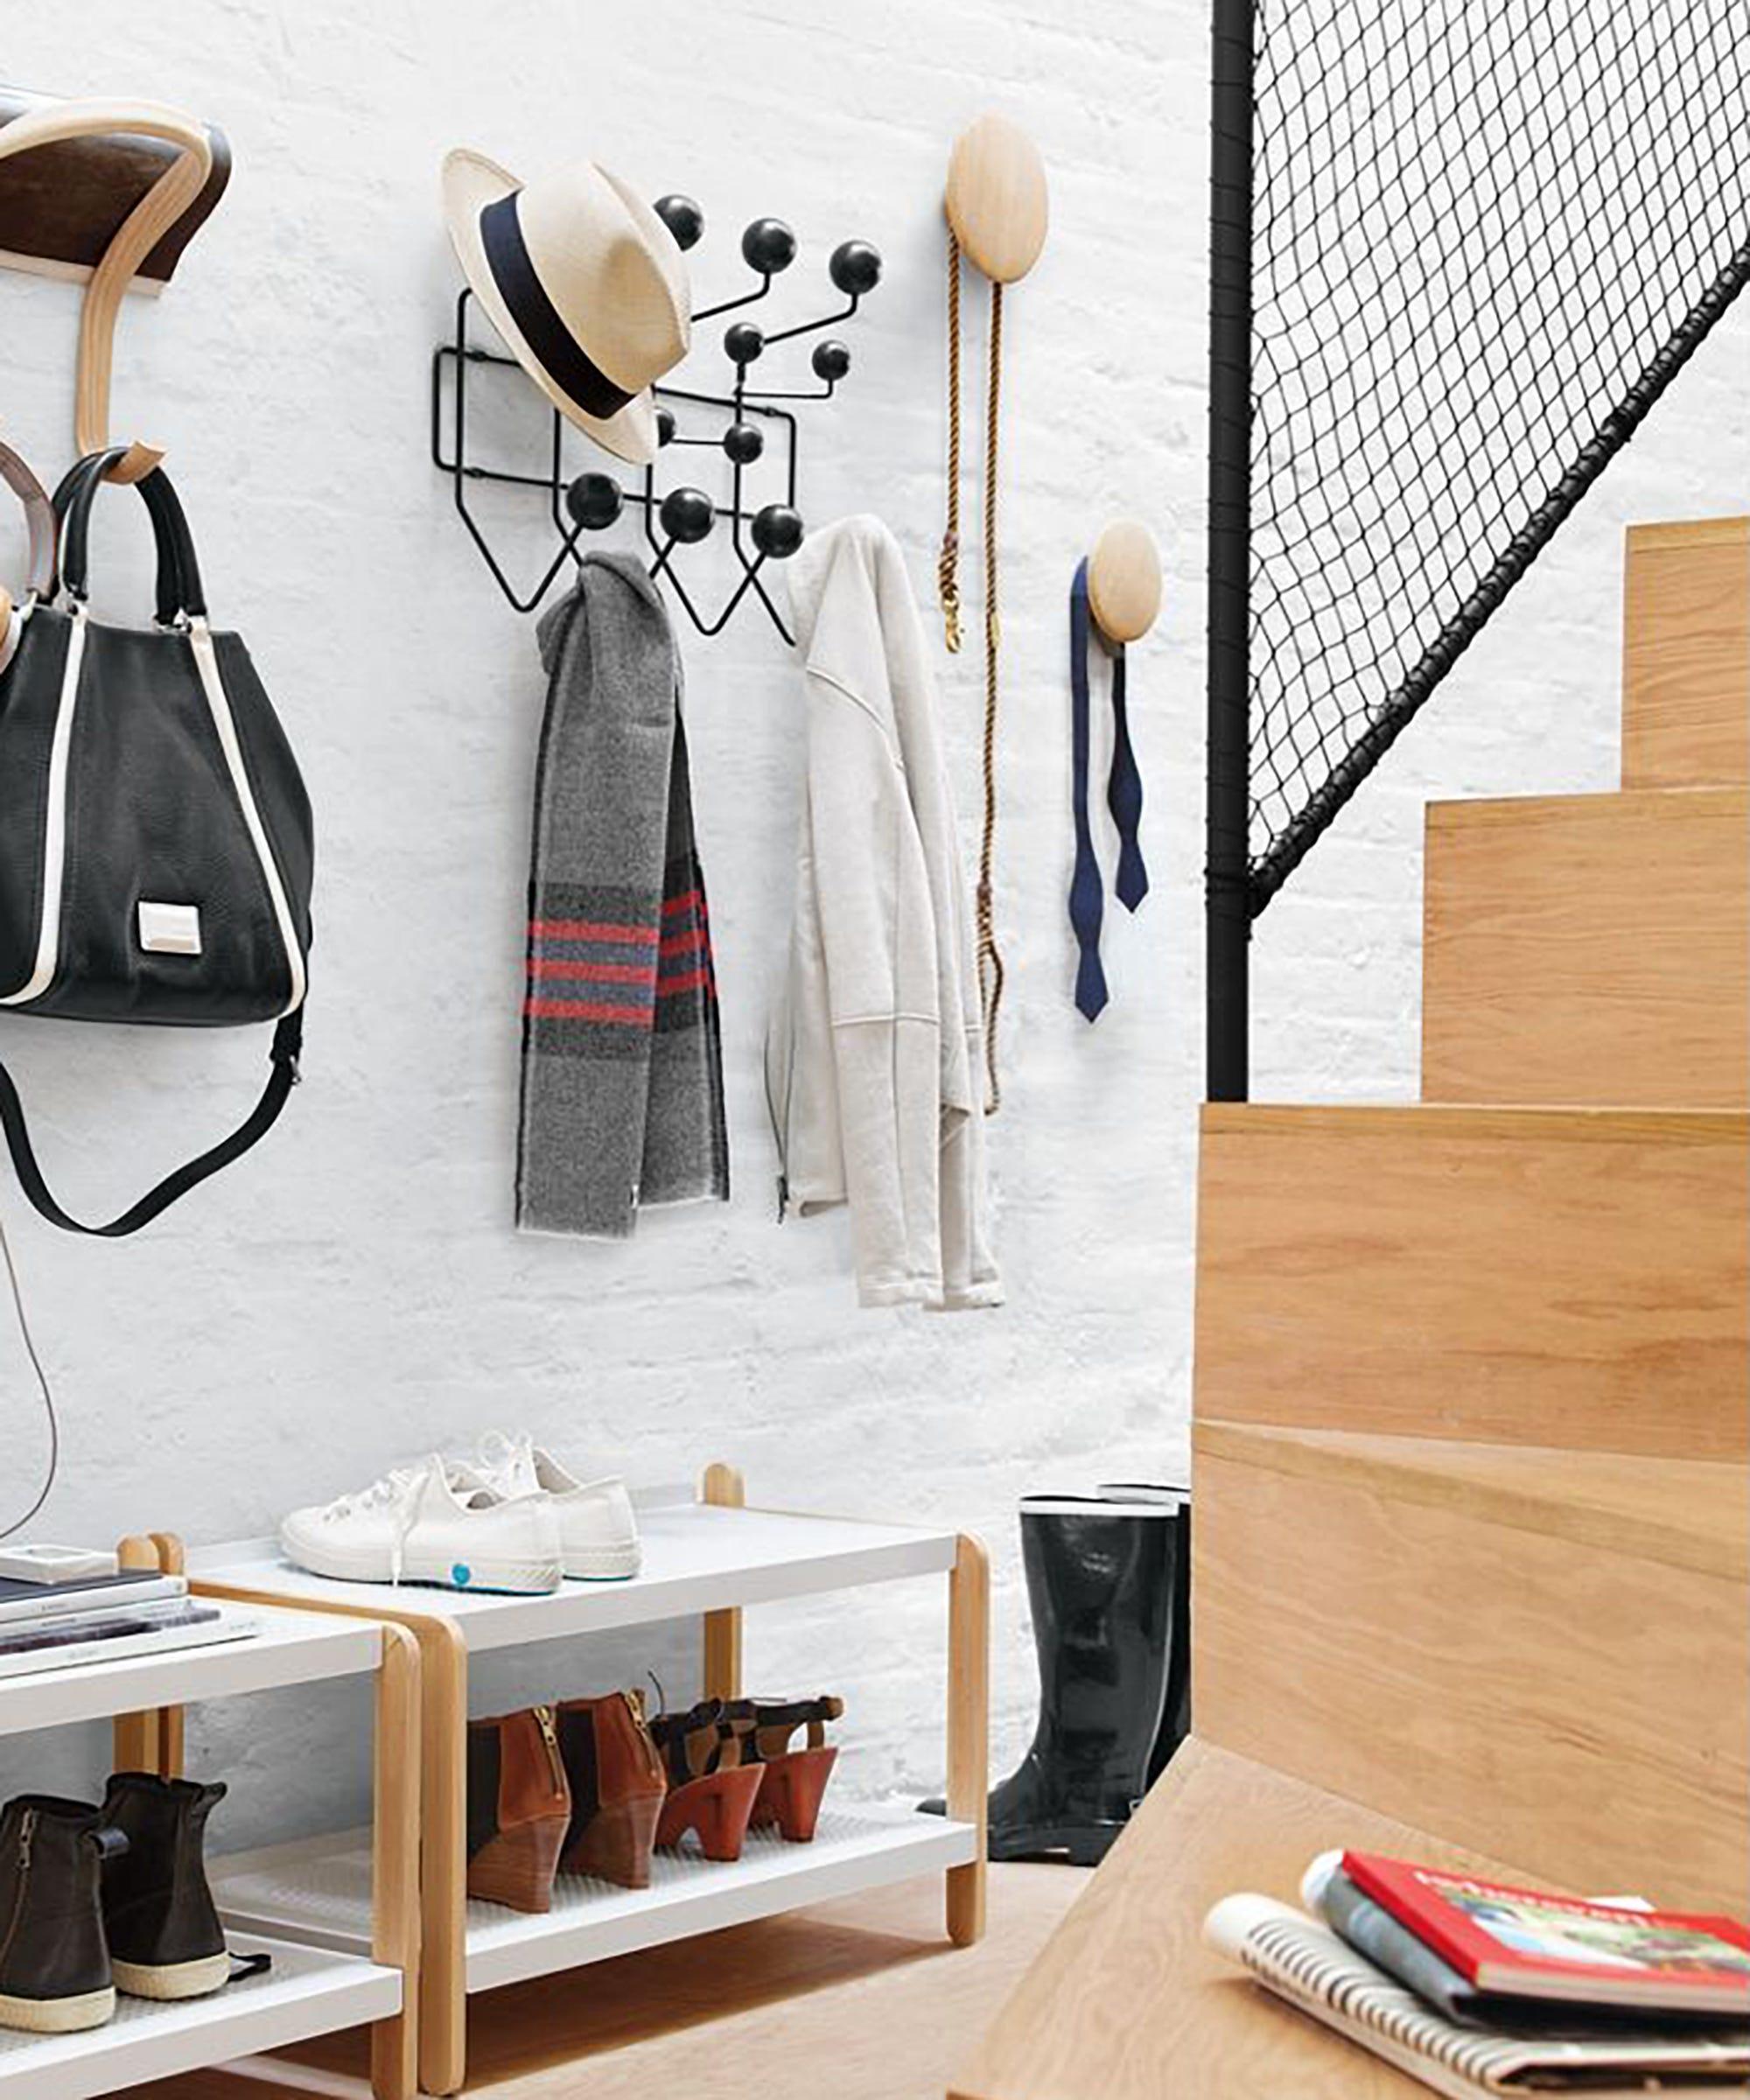 Studio Apartment Essentials small-space living, couples decorating